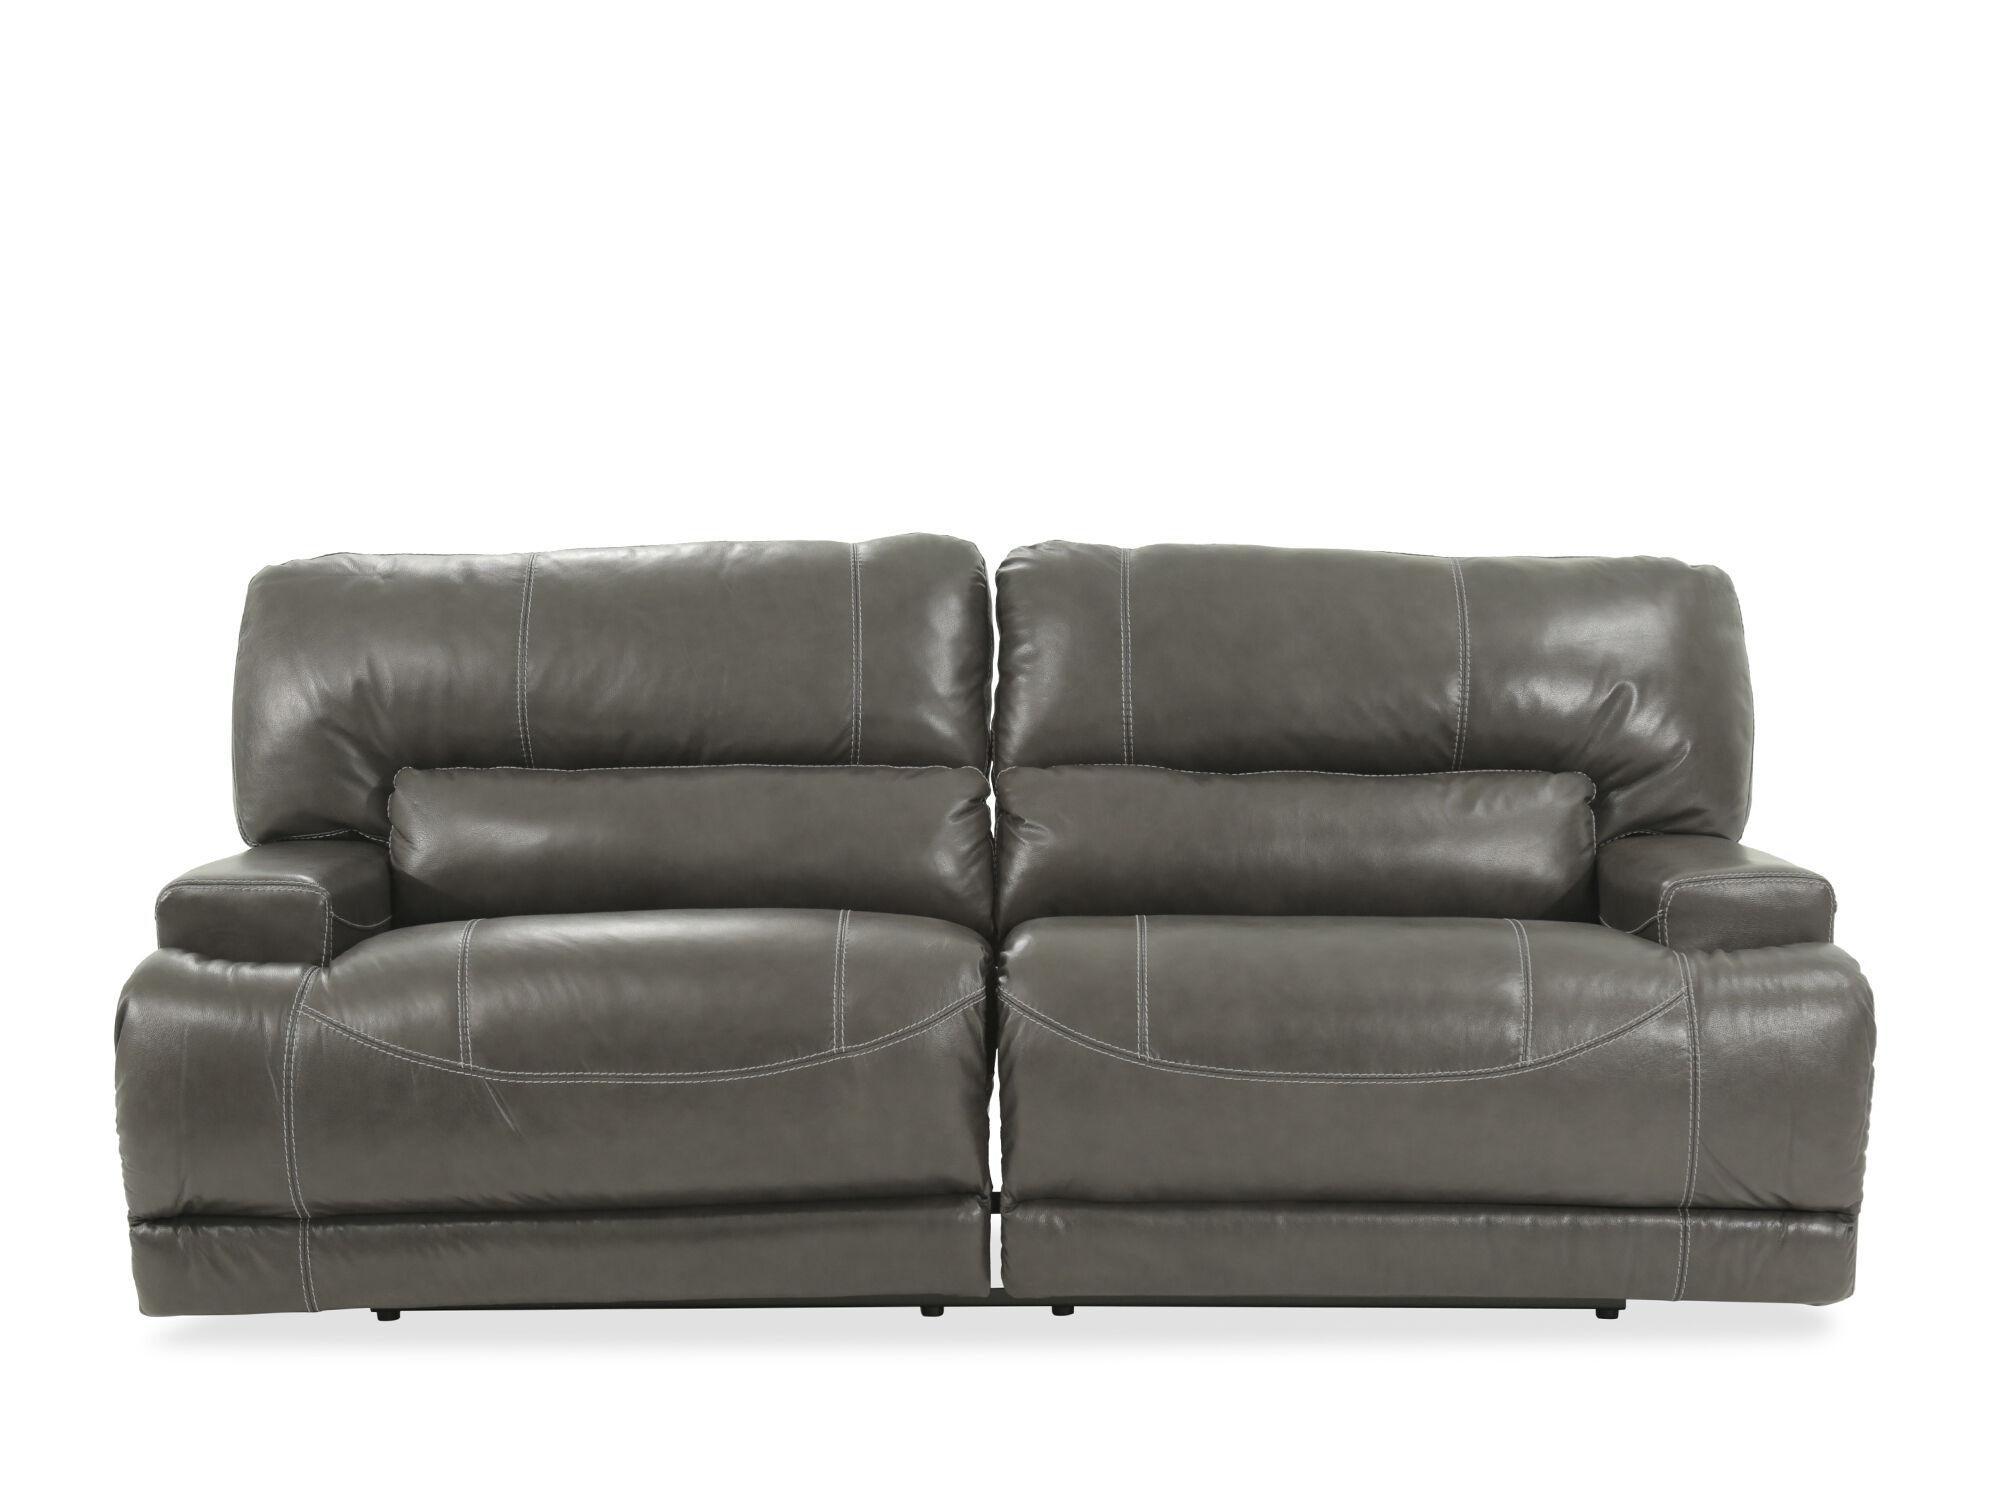 grey power reclining sofa dog bed australia ashley mccaskill gray mathis